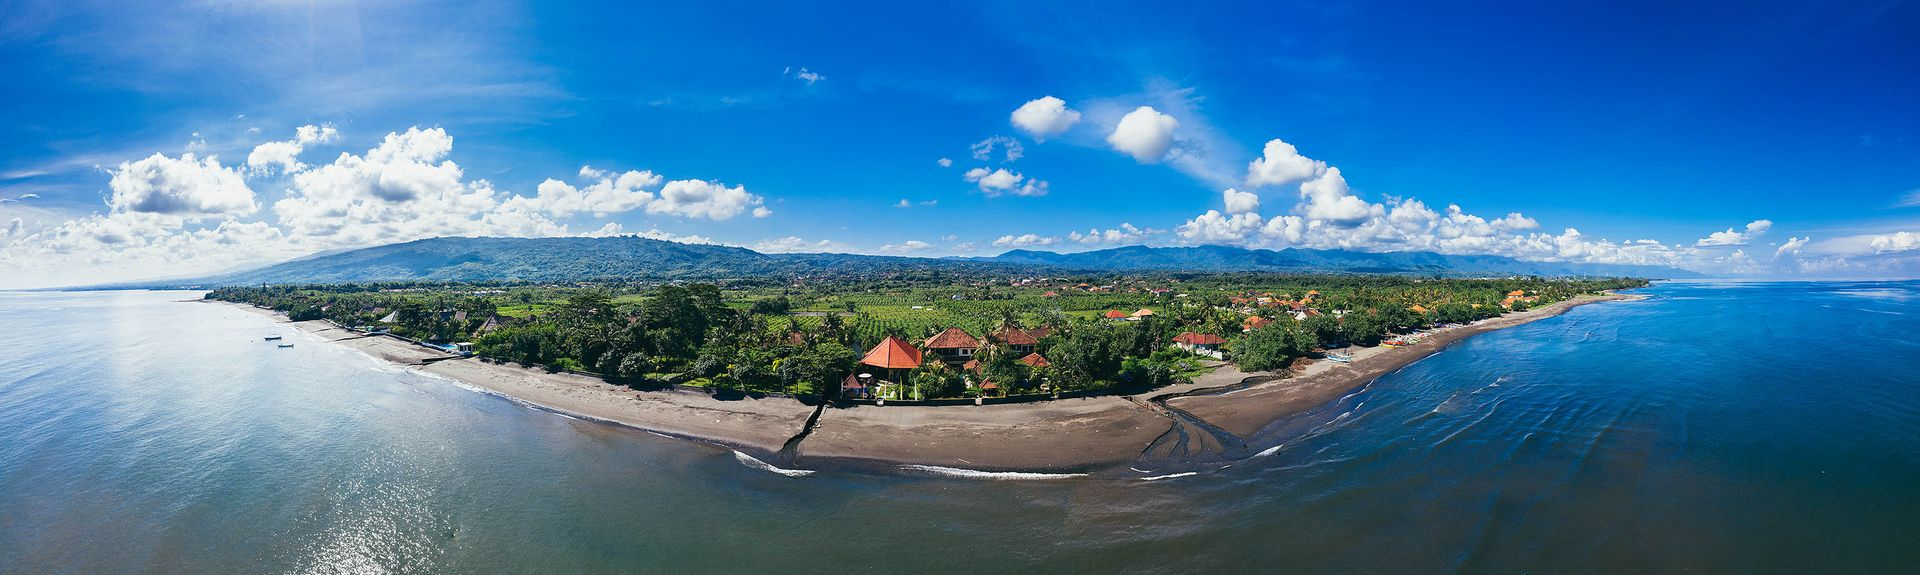 Buleleng Regency, Bali, Republic of Indonesia